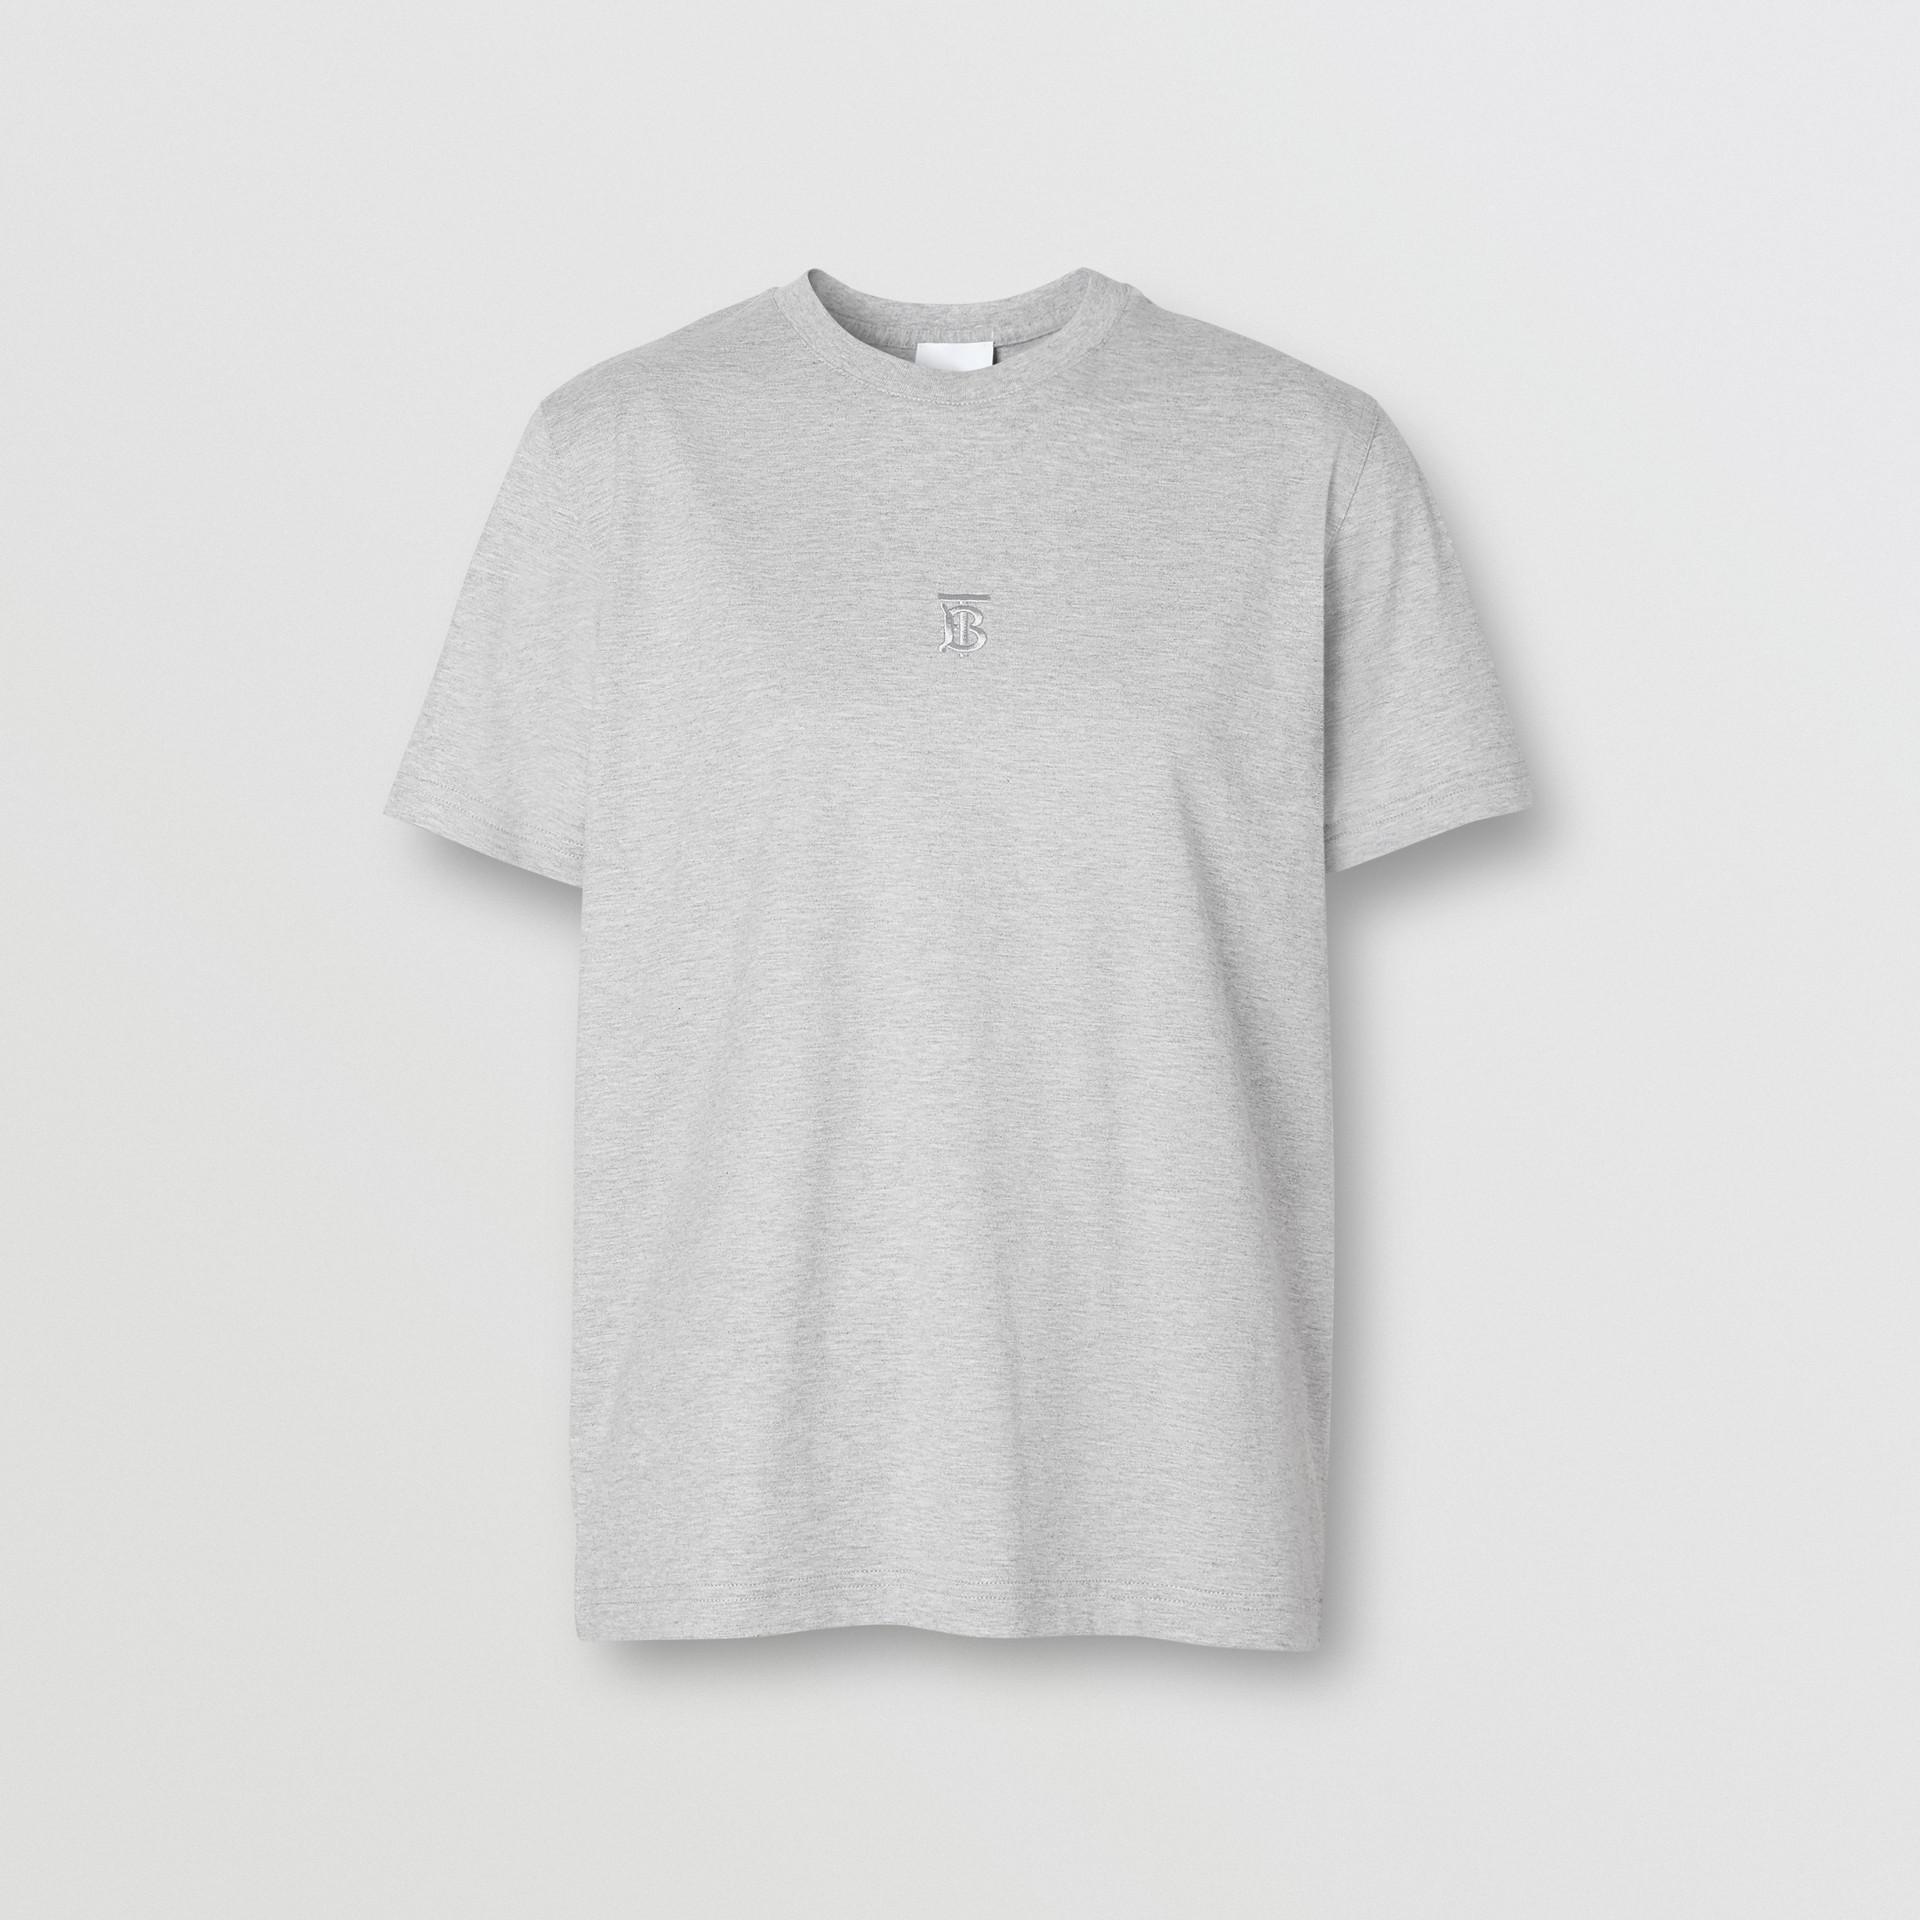 Monogram Motif Cotton T-shirt in Pale Grey Melange - Women | Burberry United Kingdom - gallery image 3